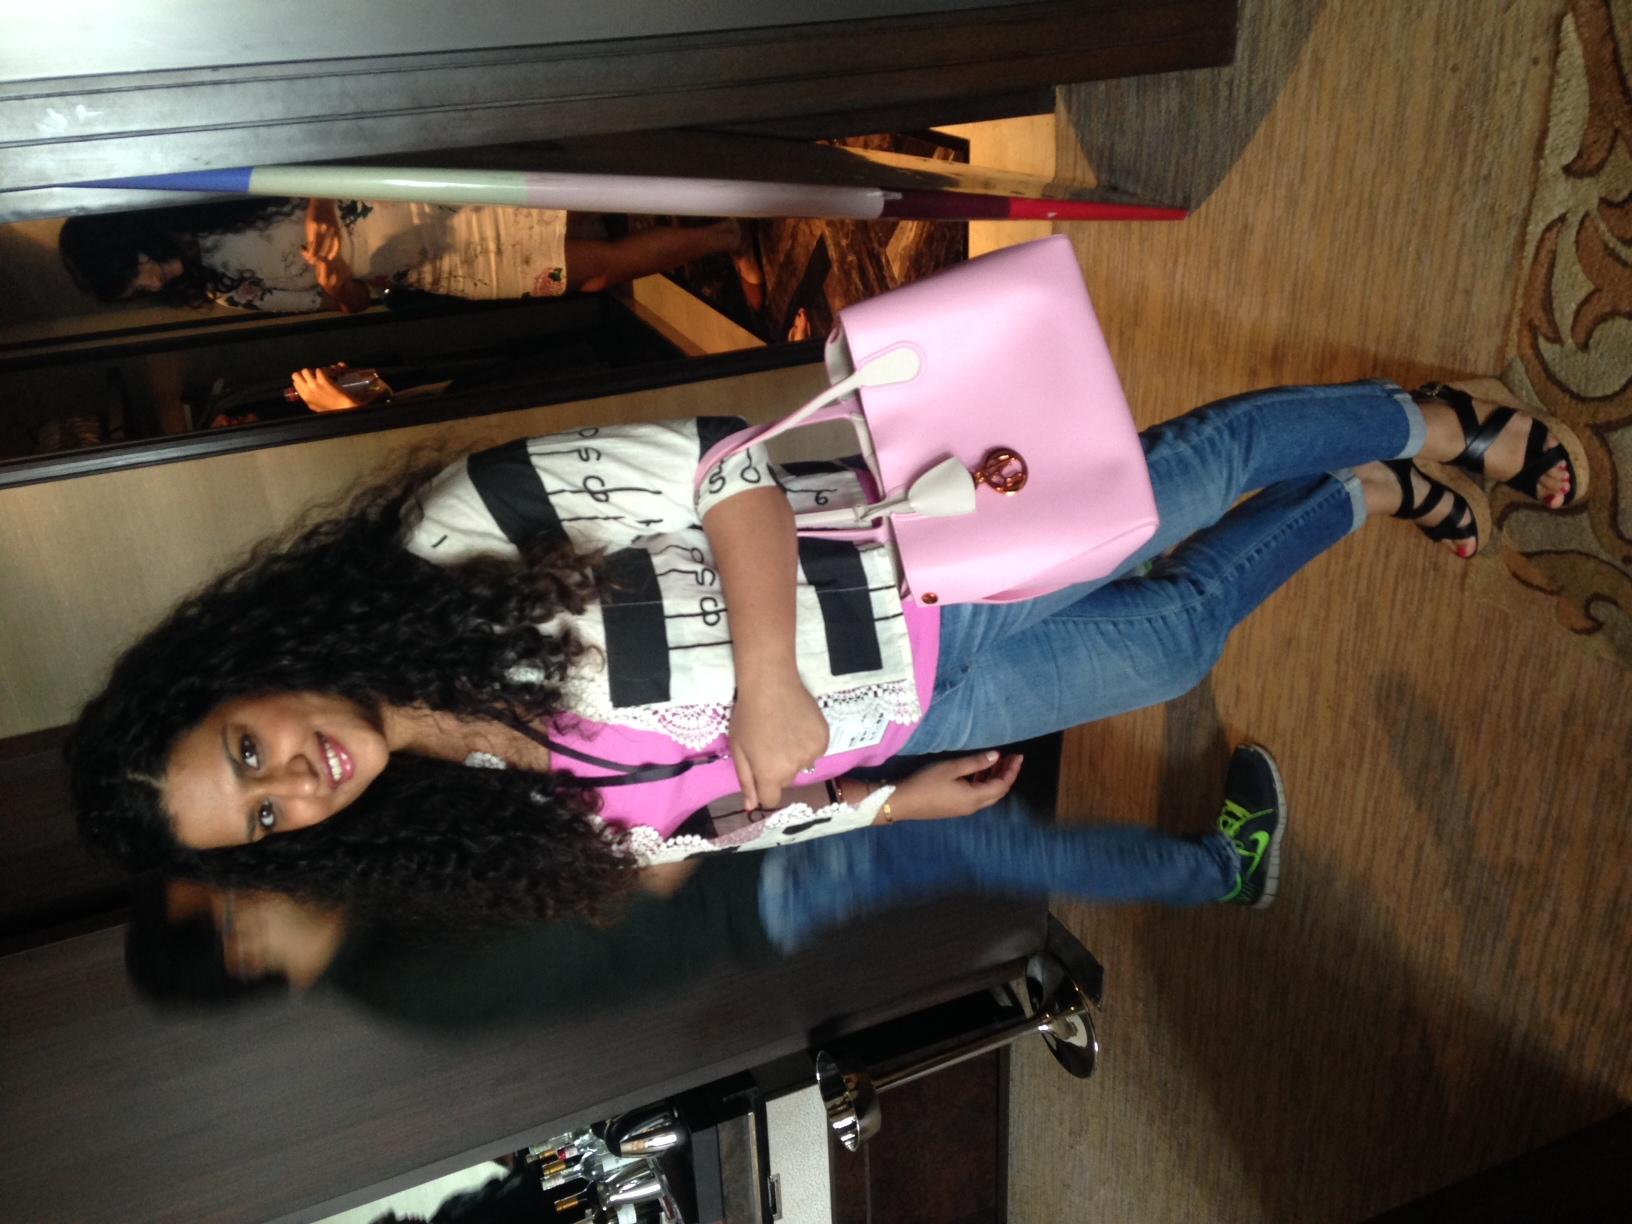 Jacket - Masaba Gupta, Tank - Ralph Lauren, Bag - Dior, Denims - AG Jeans, Shoes - Salvatore Ferragamo